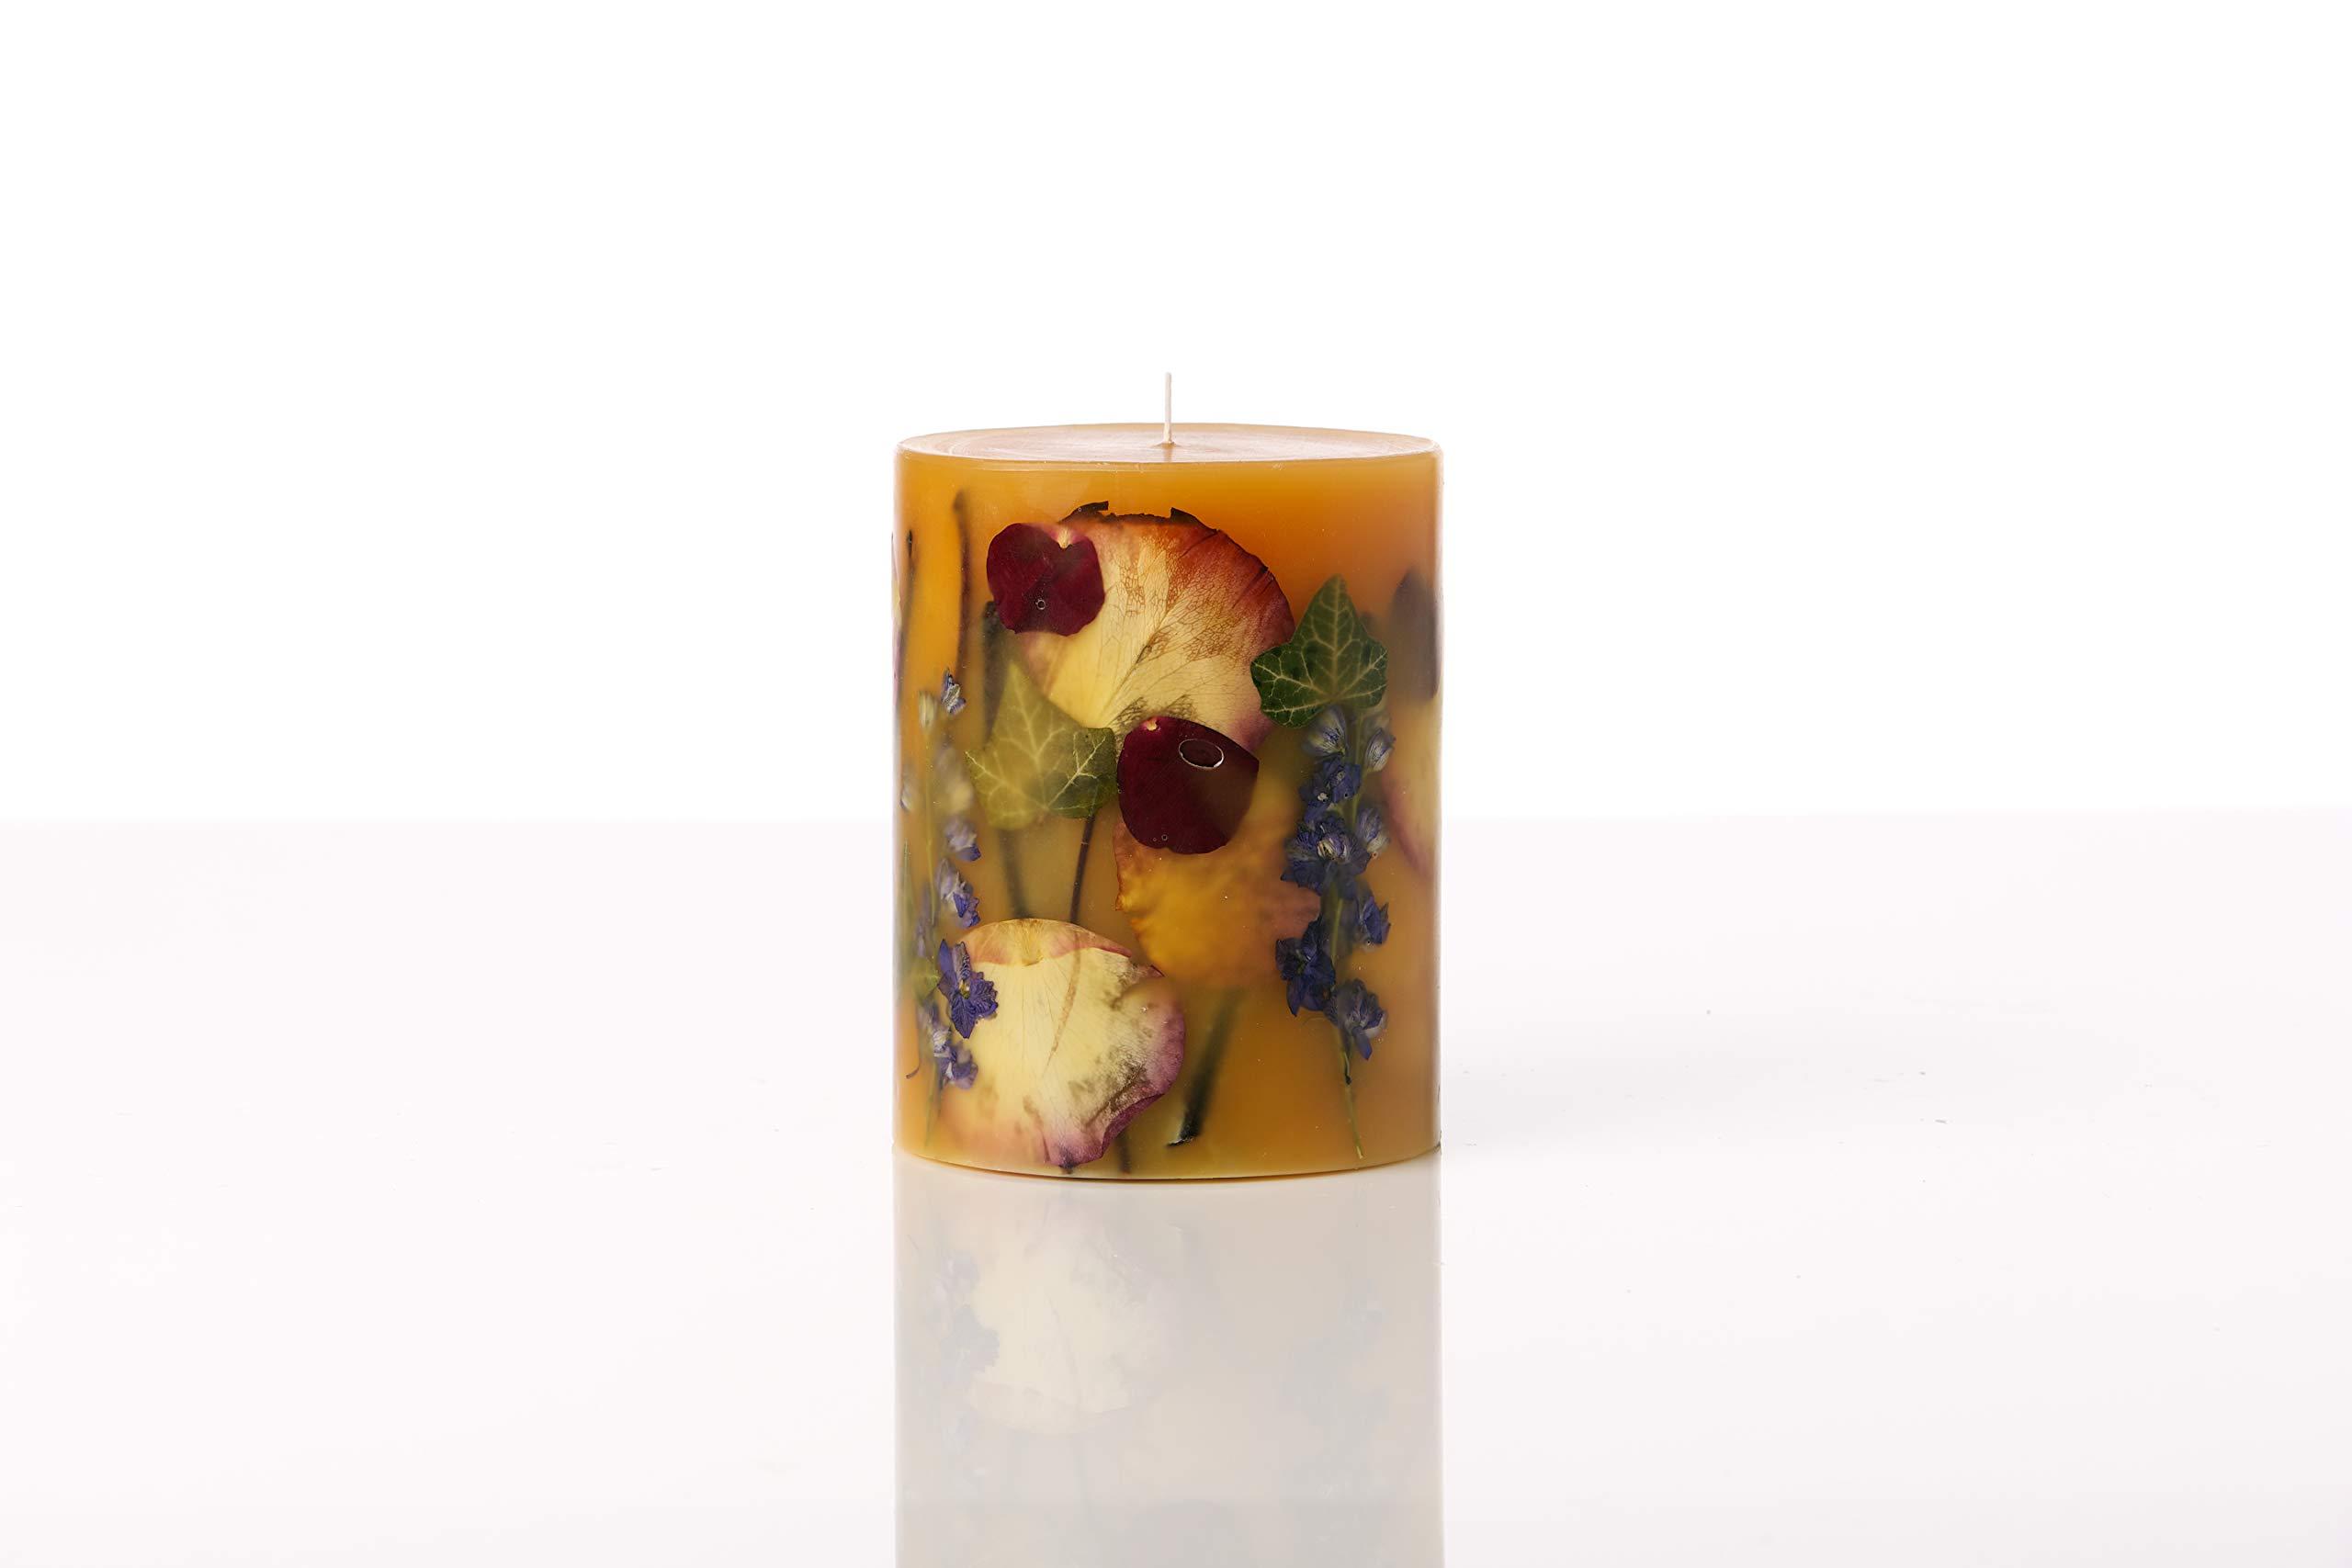 Rosy Rings Medium Round Botanical Candle - Wild Plum & Cannabis